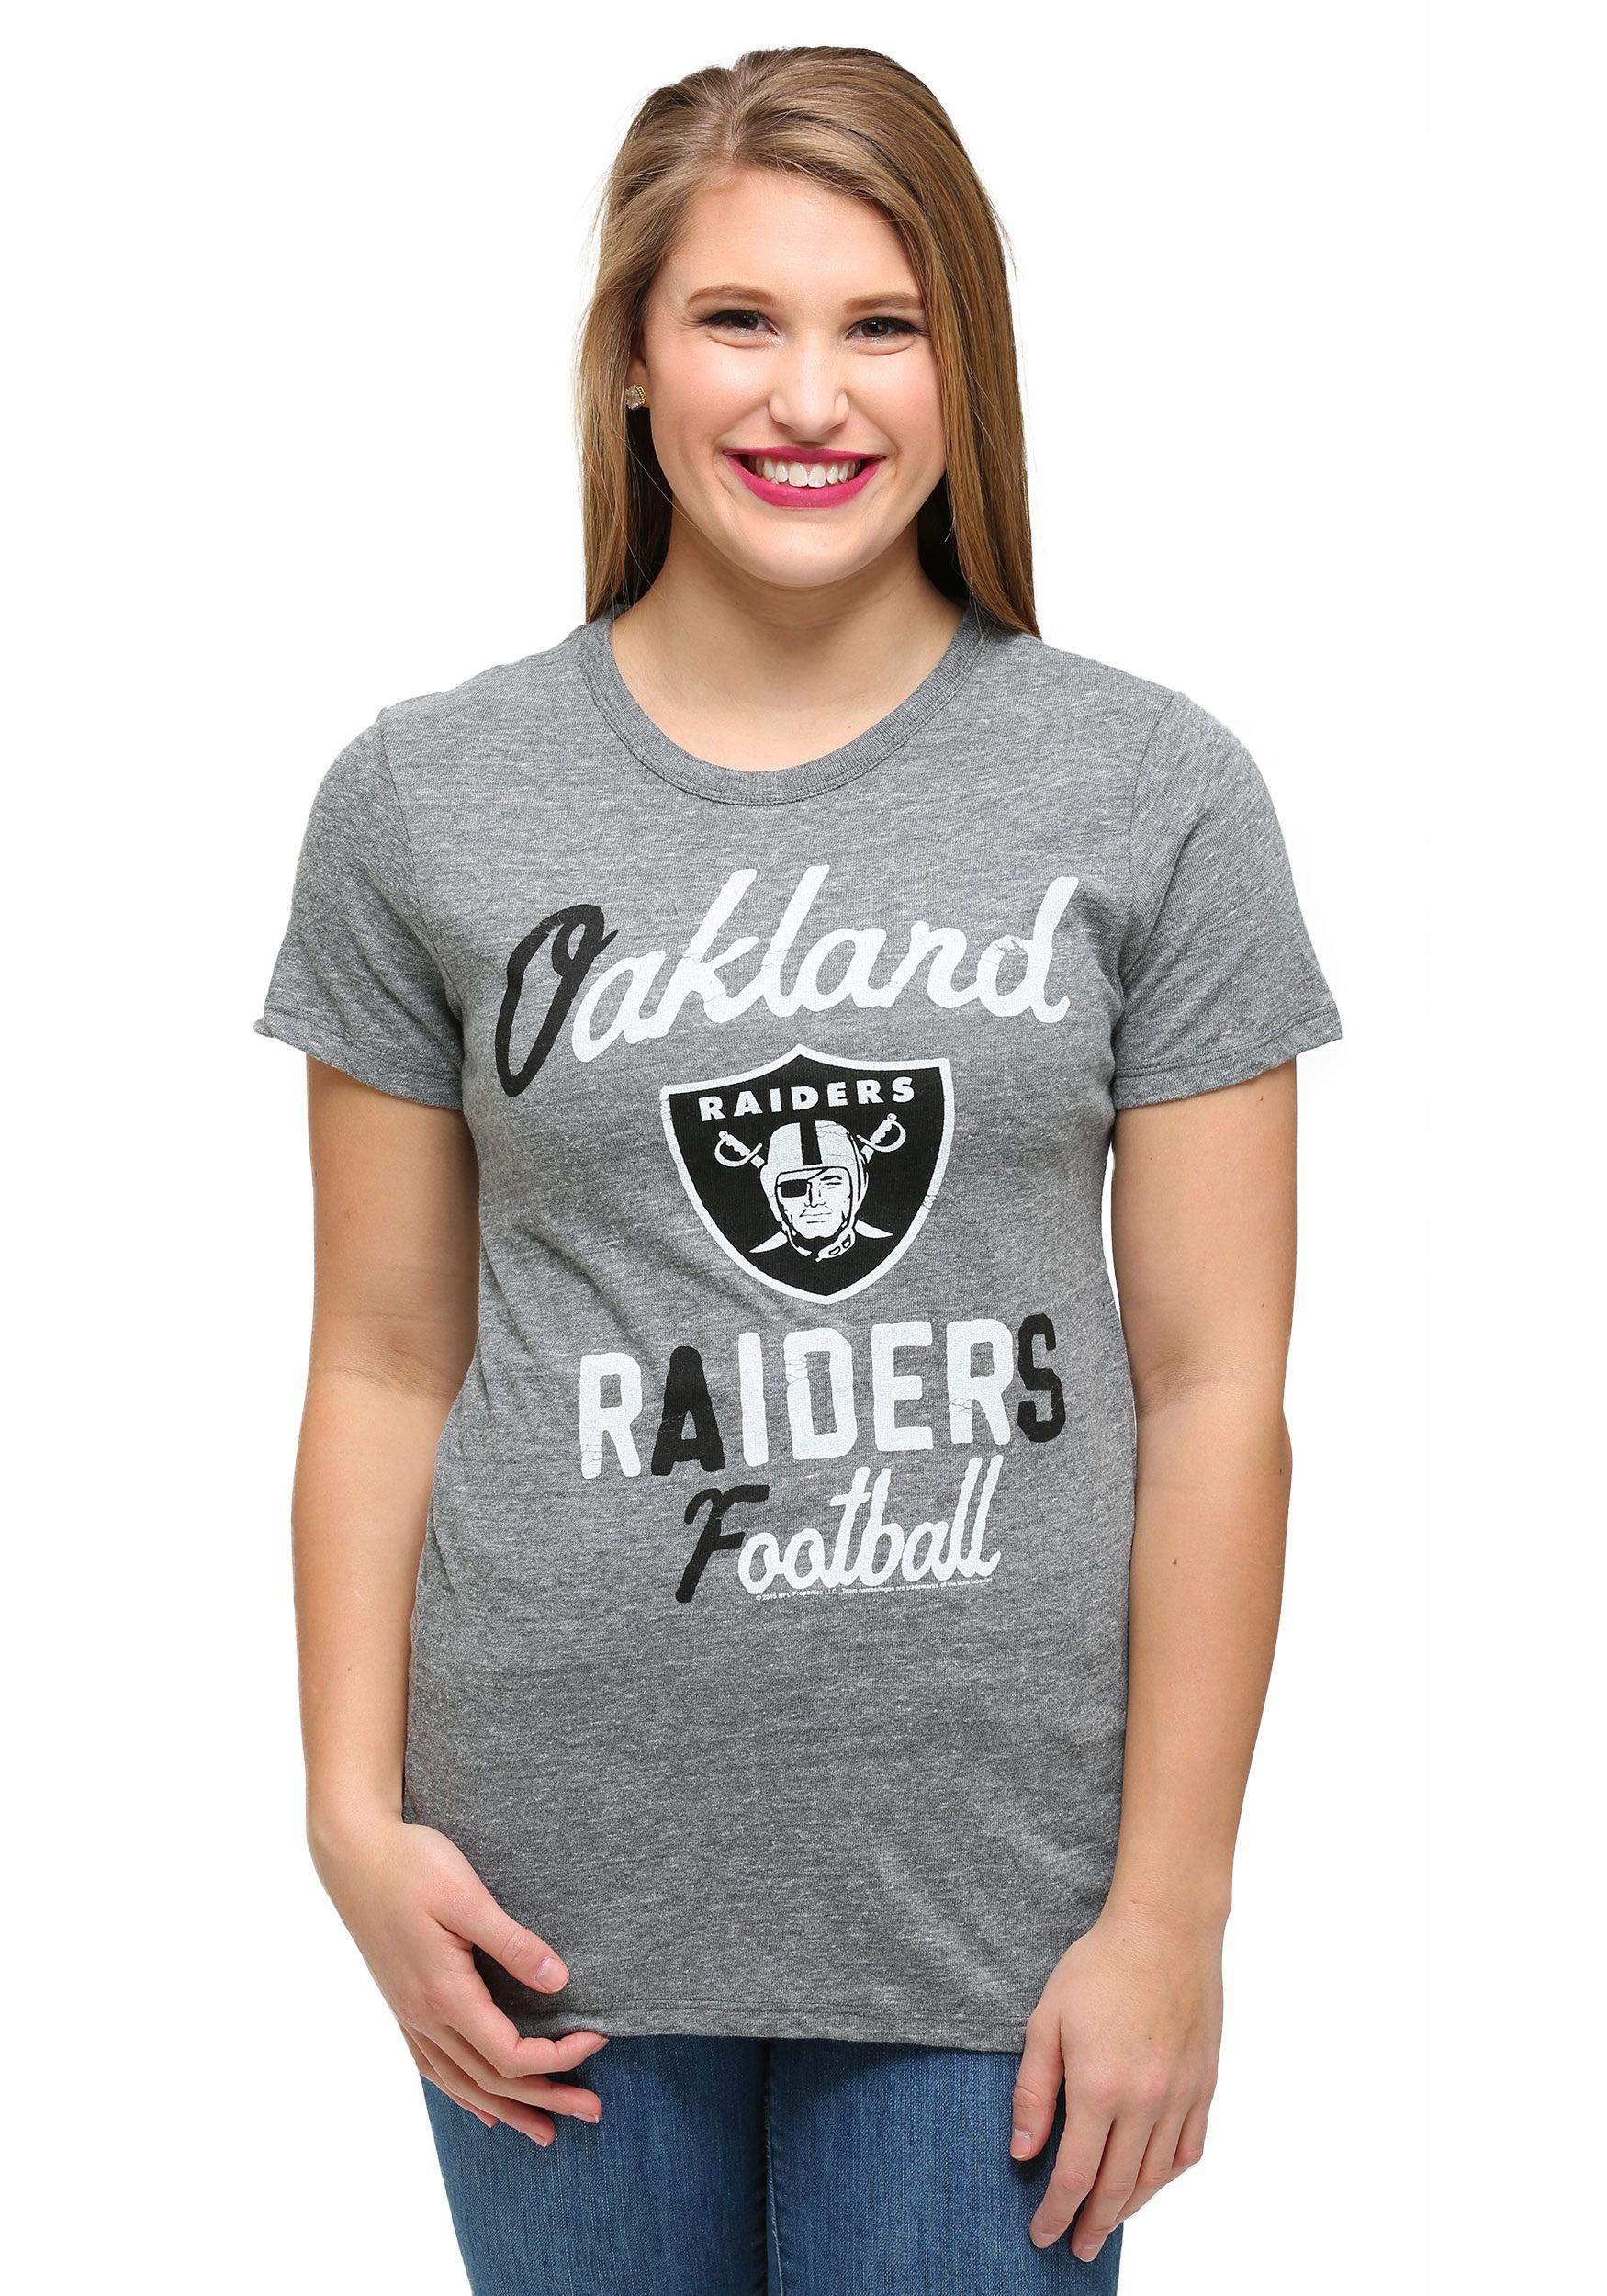 Oakland Raiders Touchdown Tri-Blend Womens T-Shirt